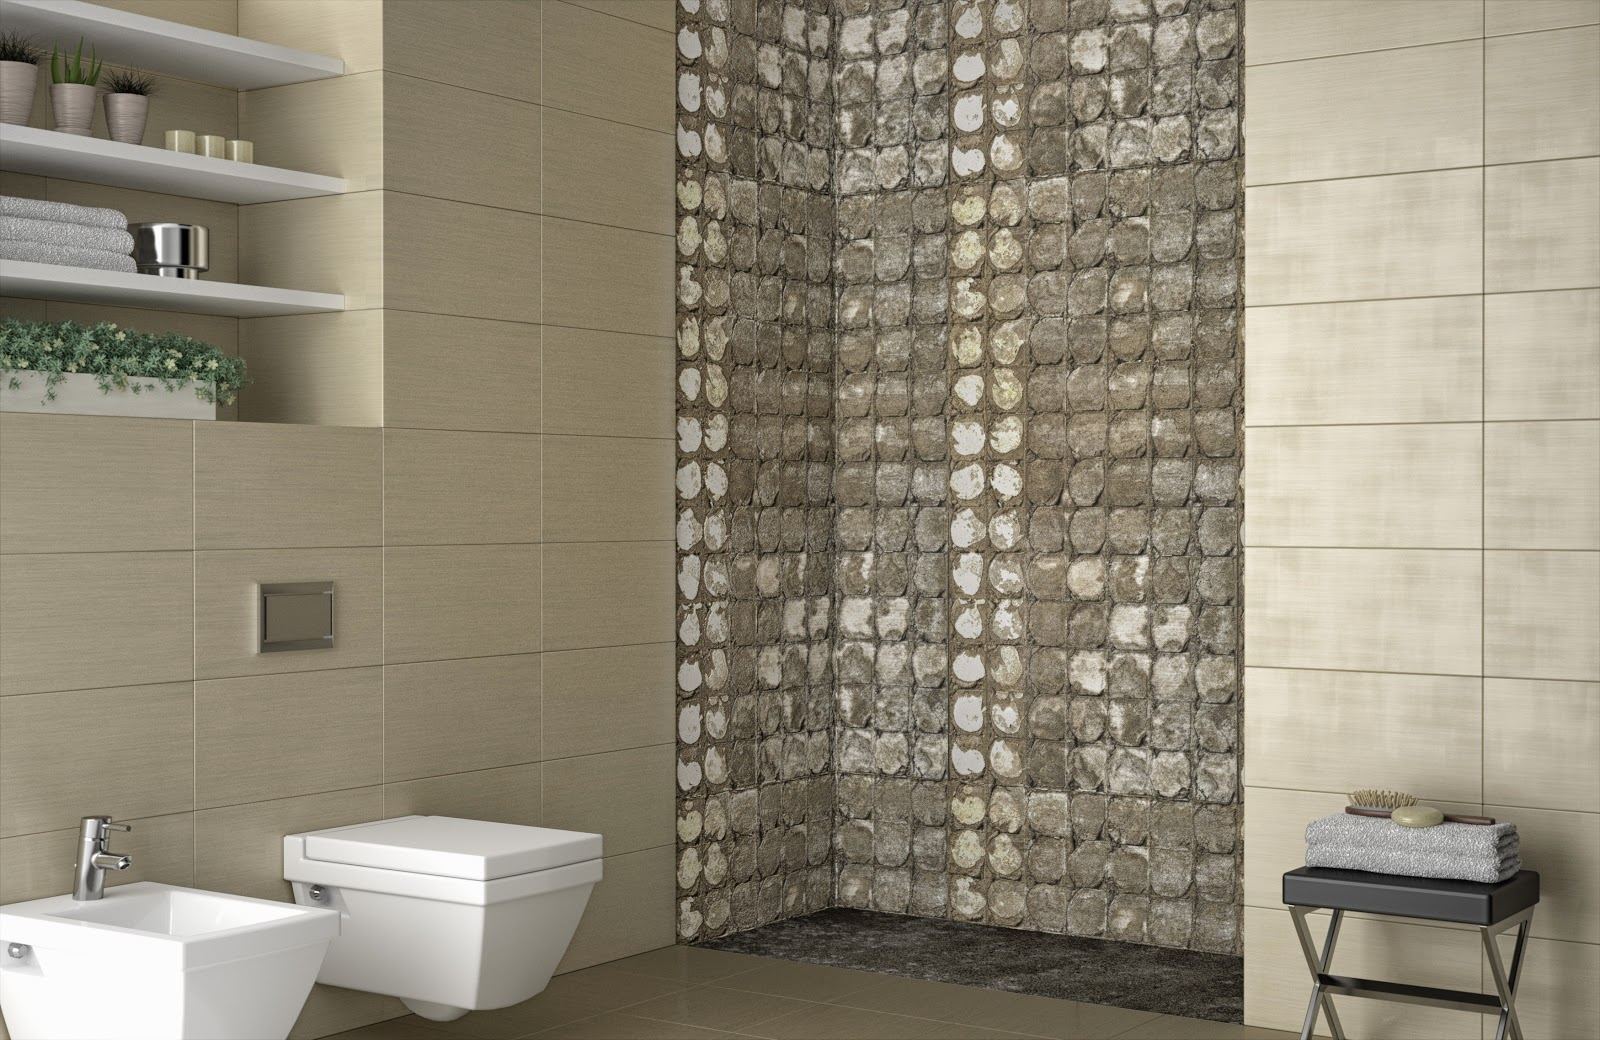 Mamparas Para Duchas De Obra Stunning Excellent Simple Para Duchas - Mamparas-para-duchas-de-obra